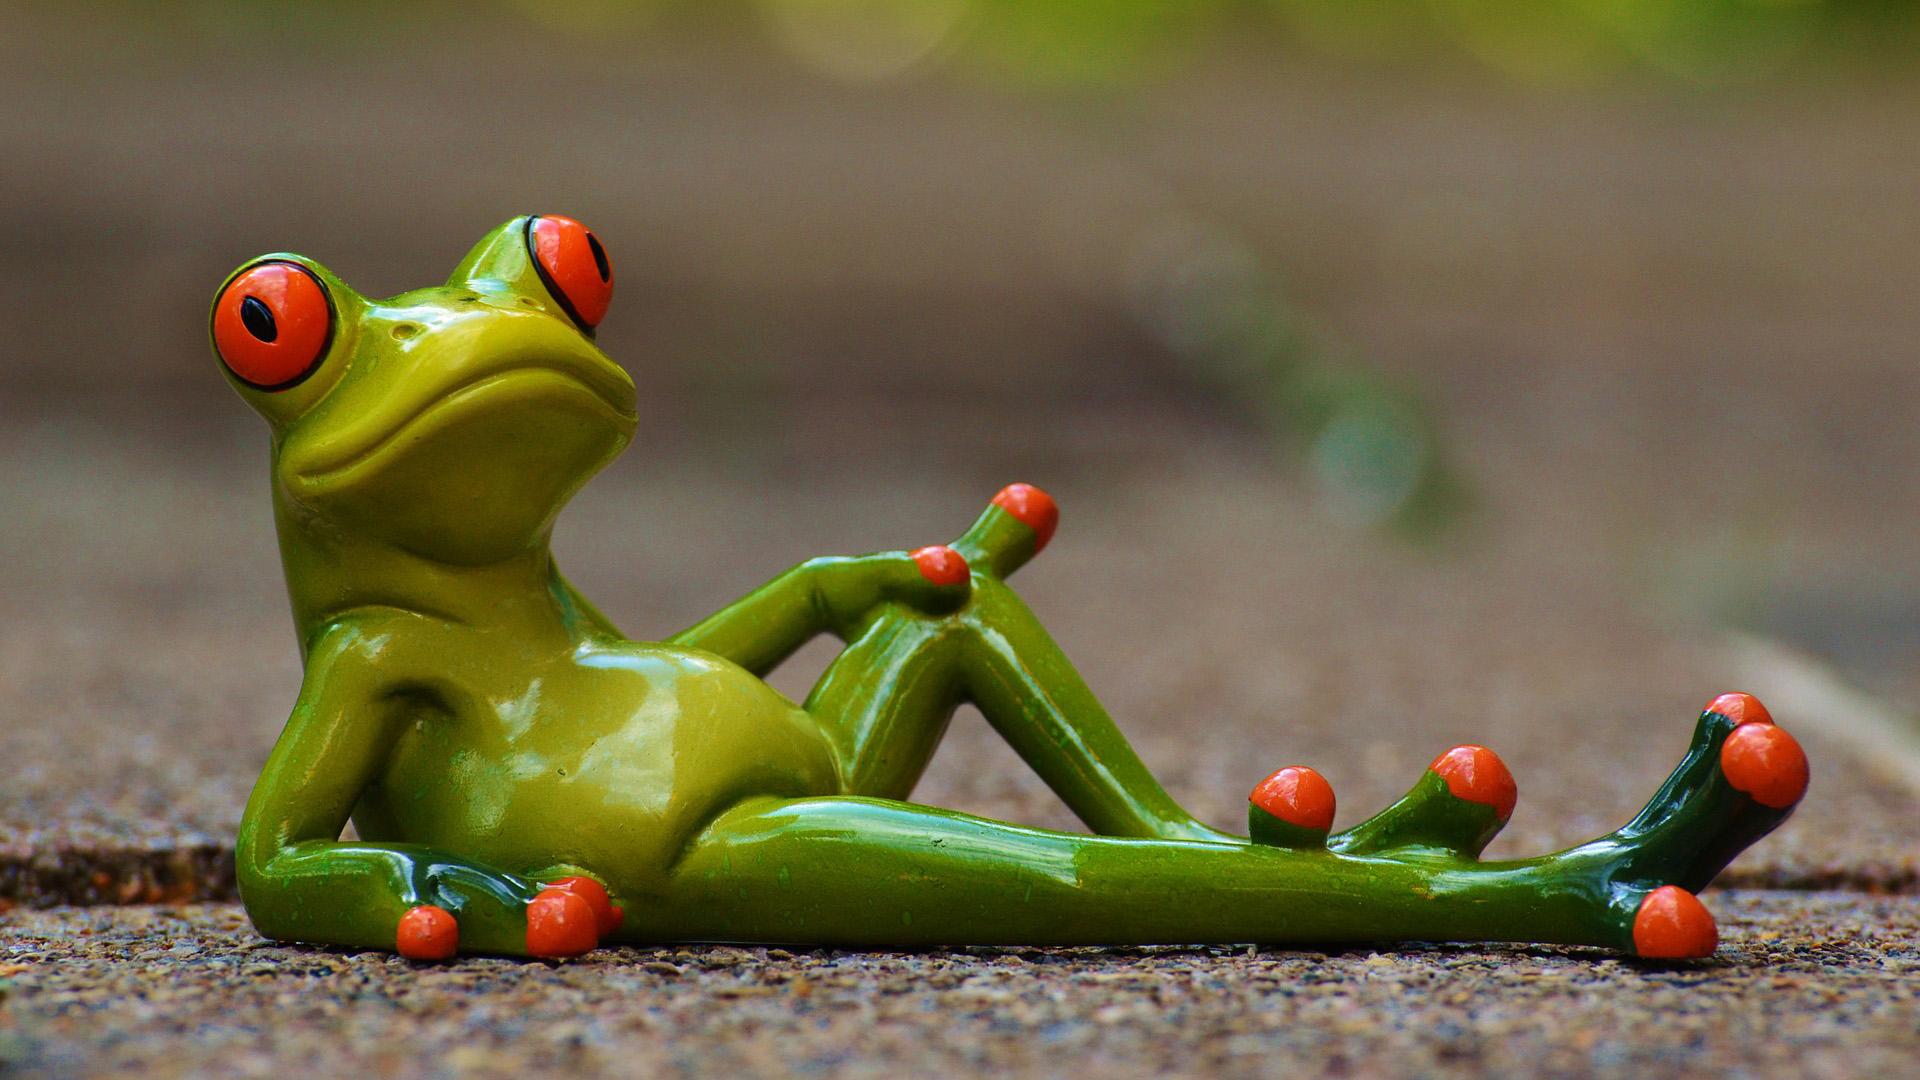 frog_1920